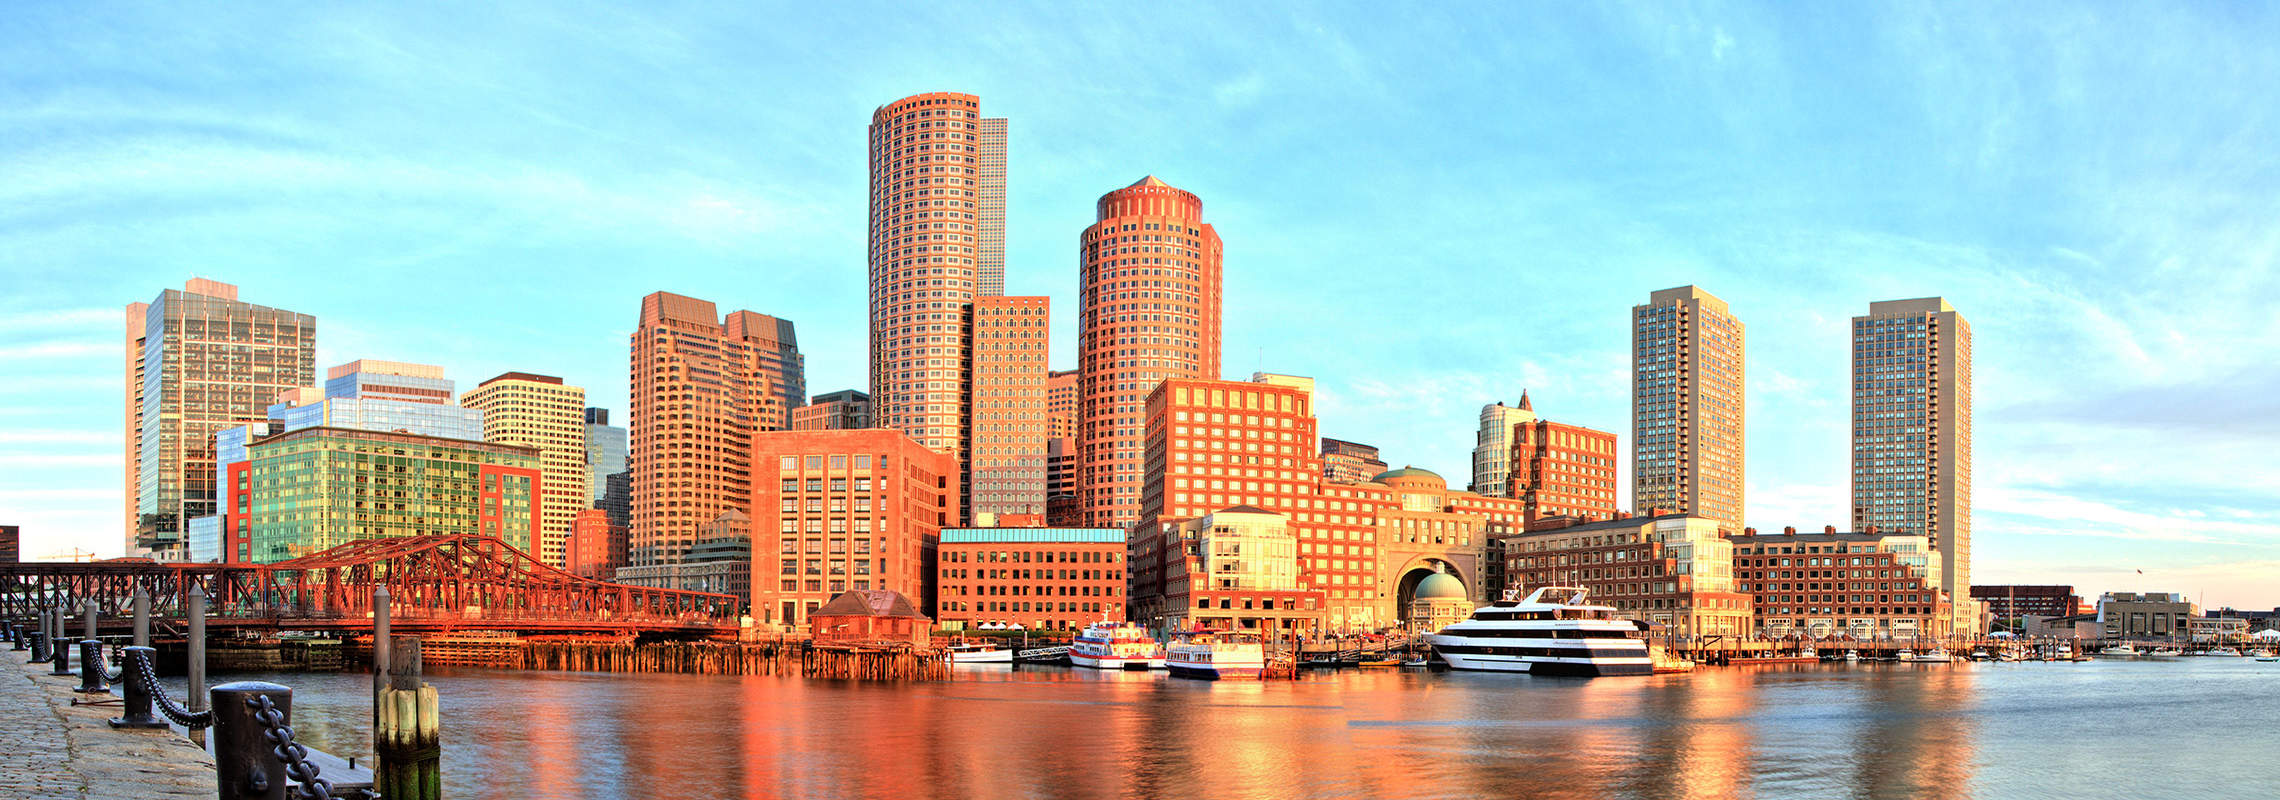 Boston, Massachussetts